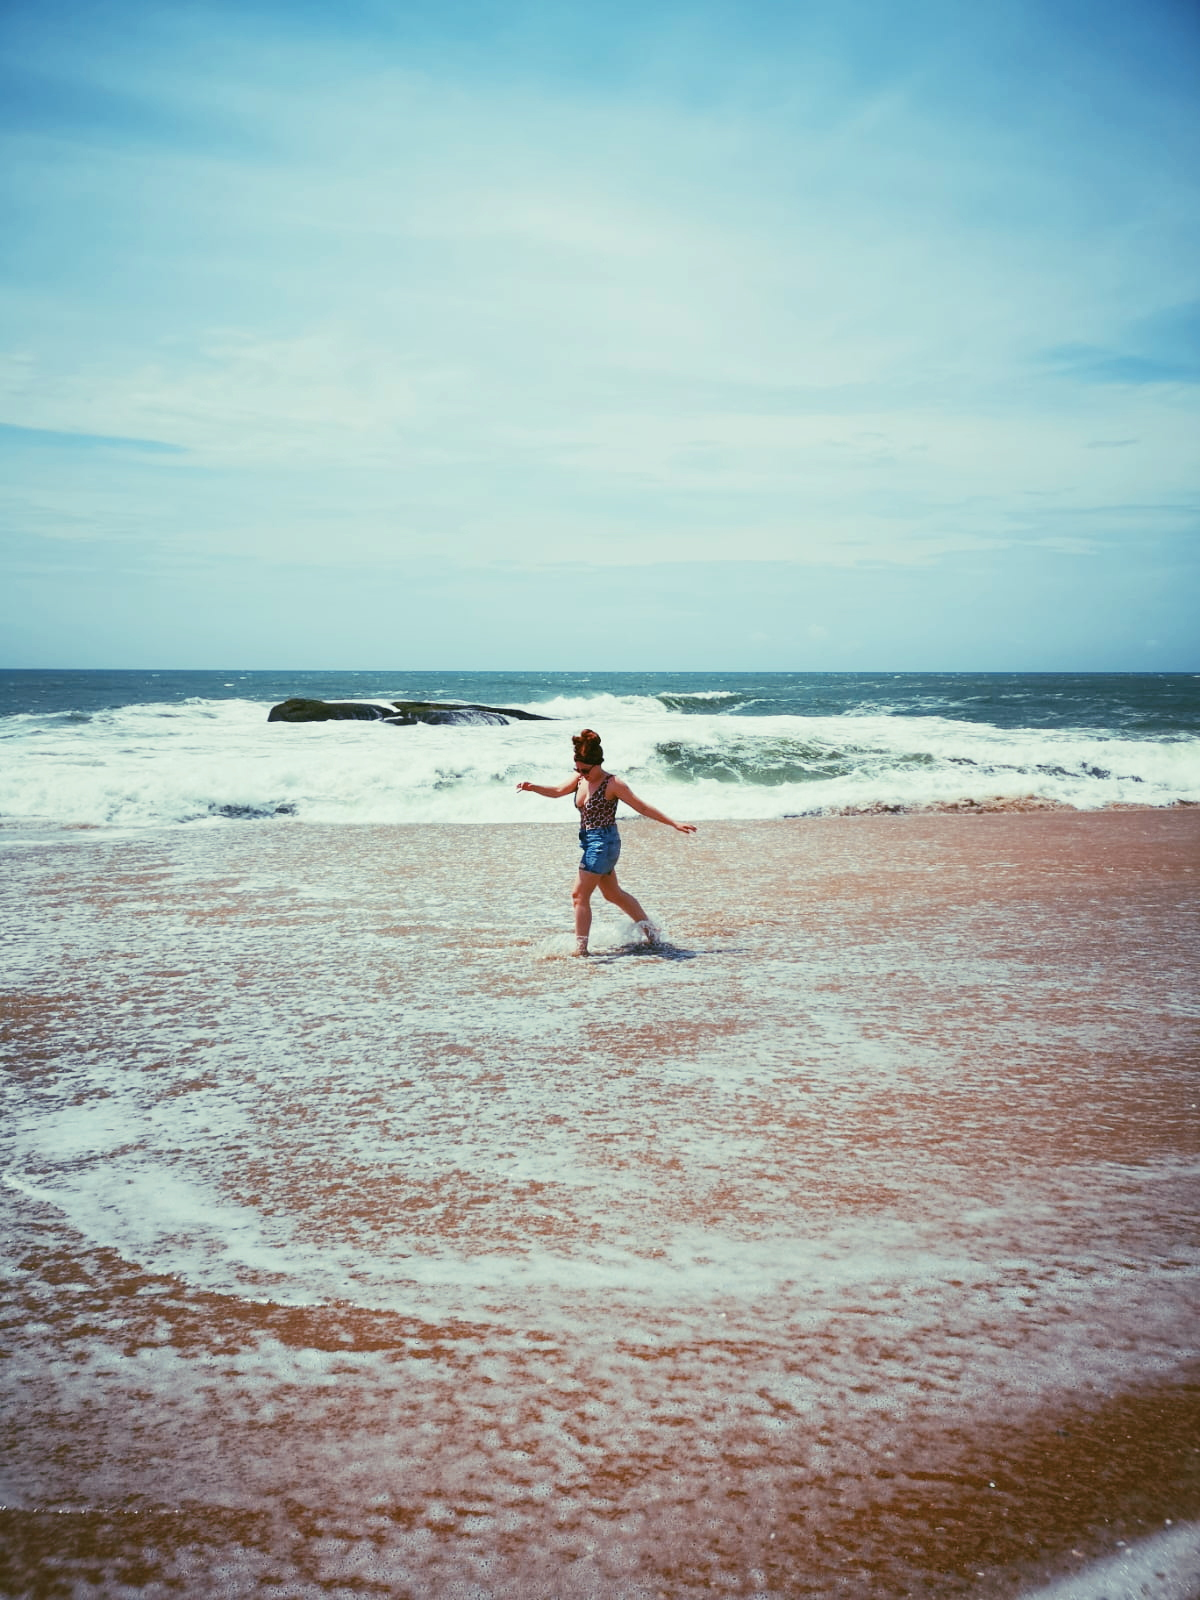 invite-to-paradise-sri-lanka-holiday-honeymoon-specialists-customer-feedback-elin-jordan-luce-yala-beach-walk.JPG